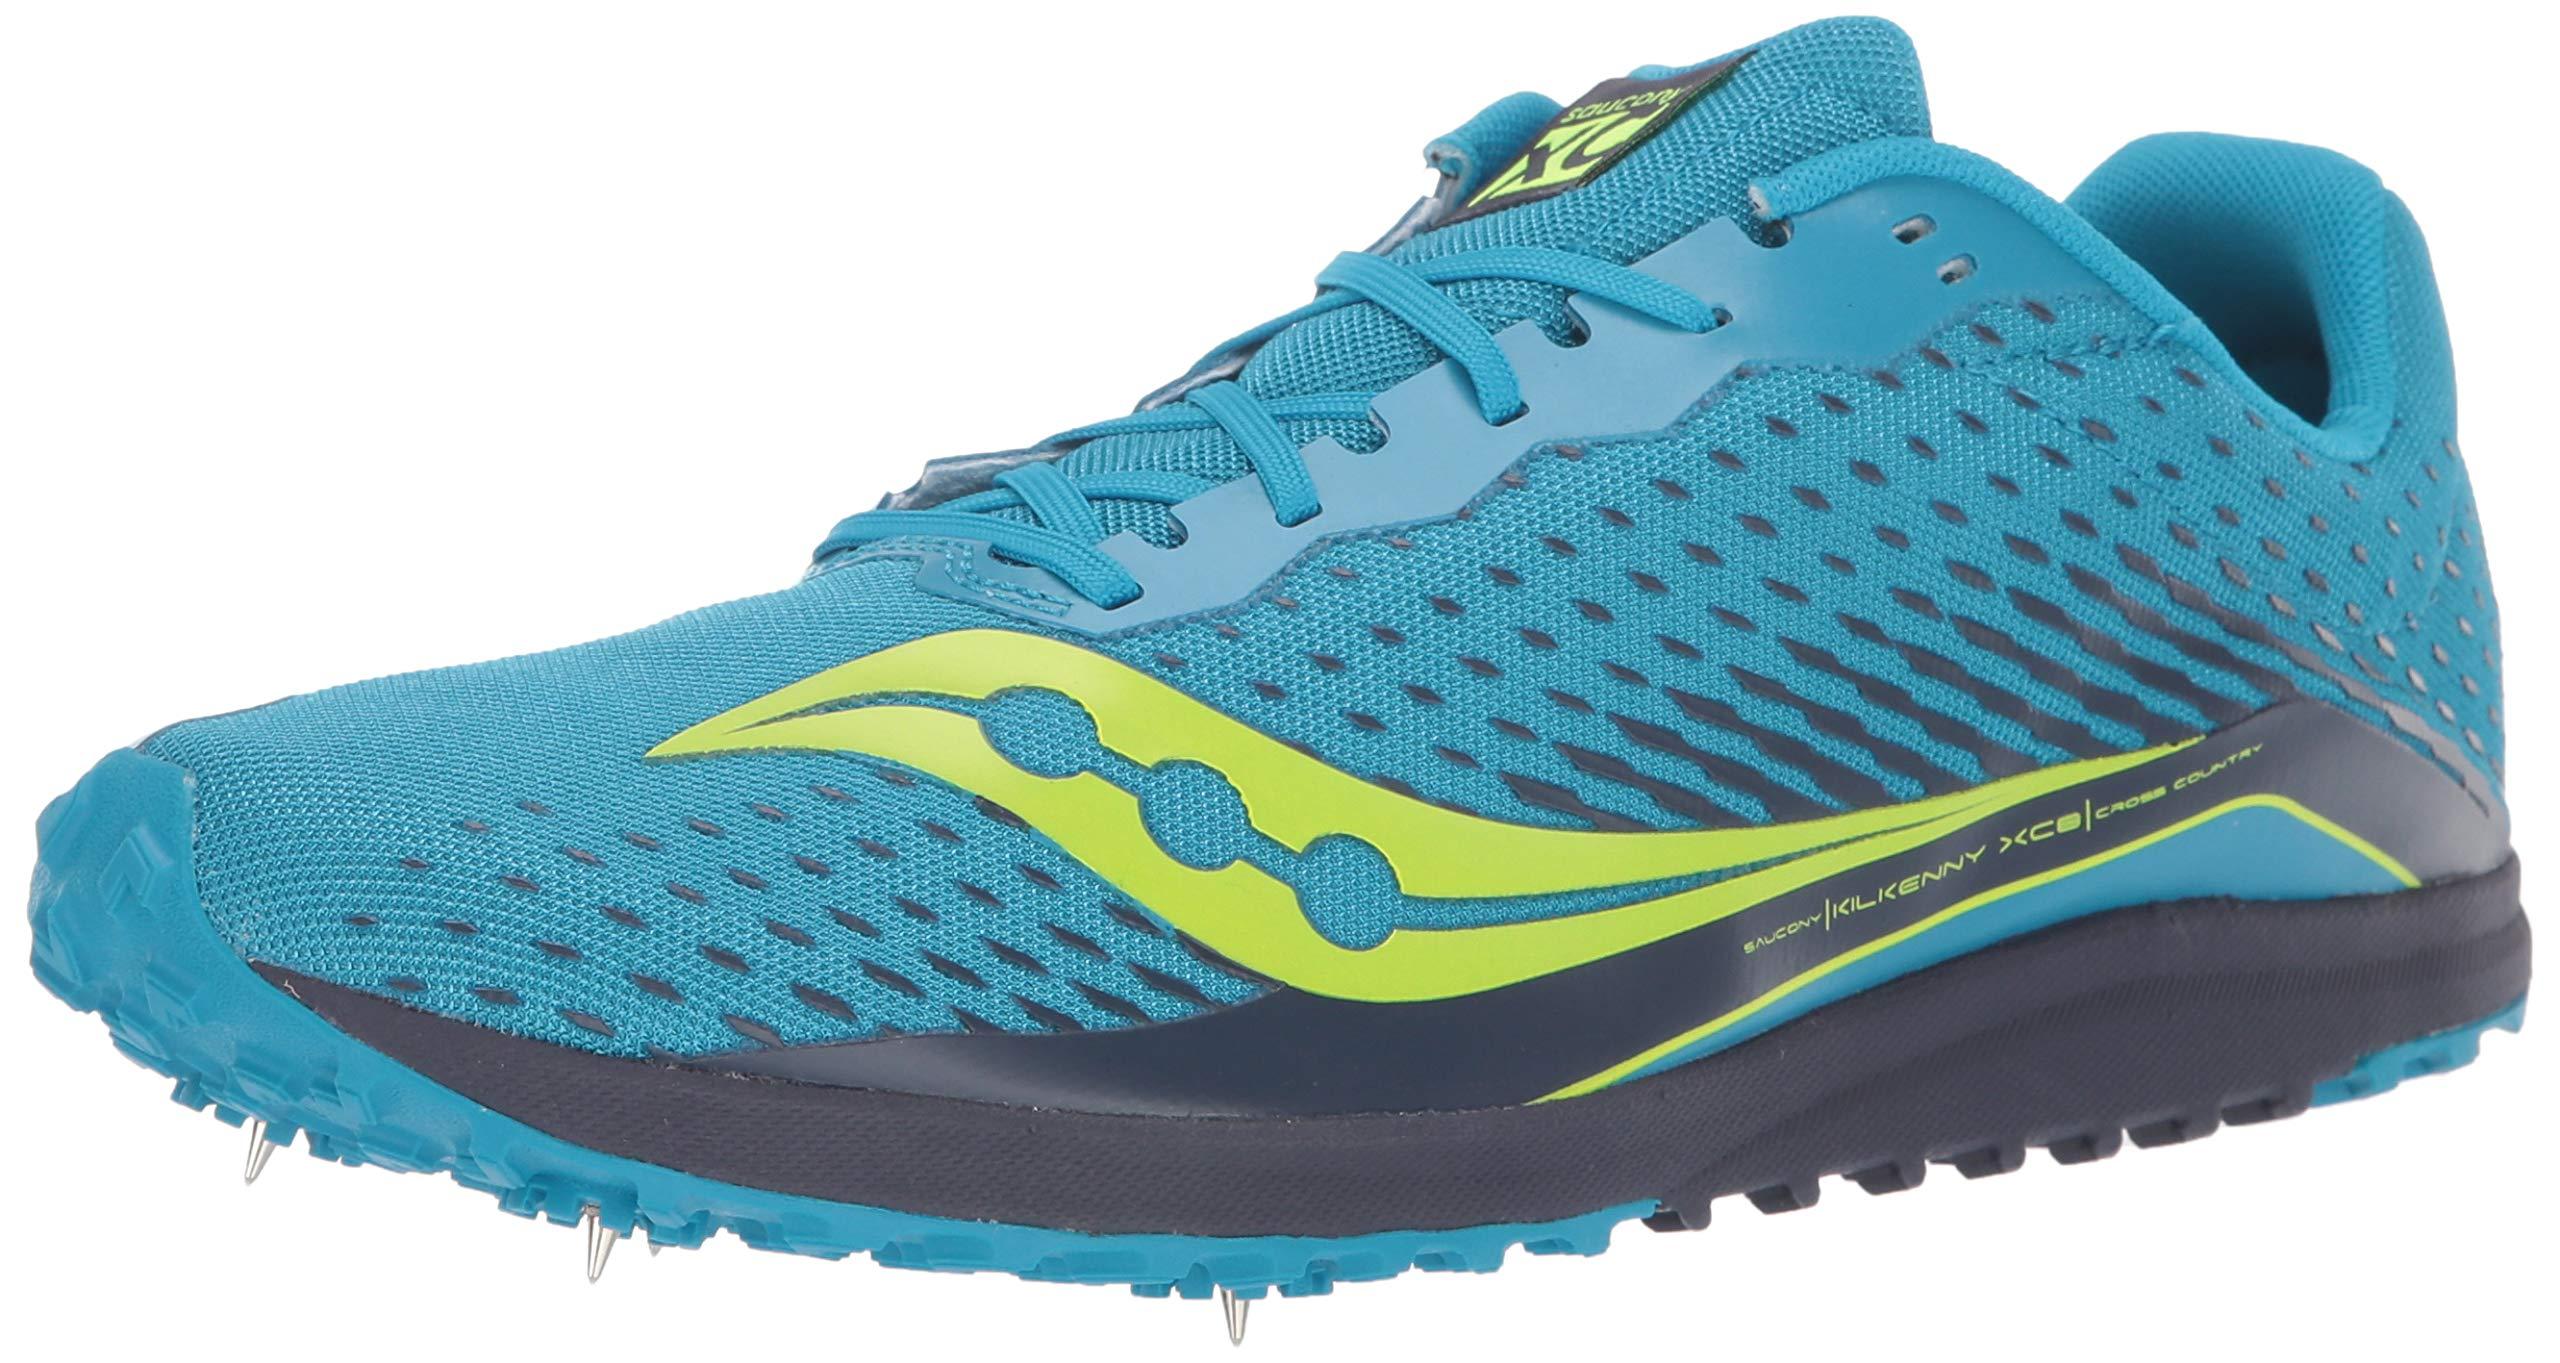 Saucony Men's Kilkenny XC 8 Track Shoe, Blue/Citron, 5 Medium US by Saucony